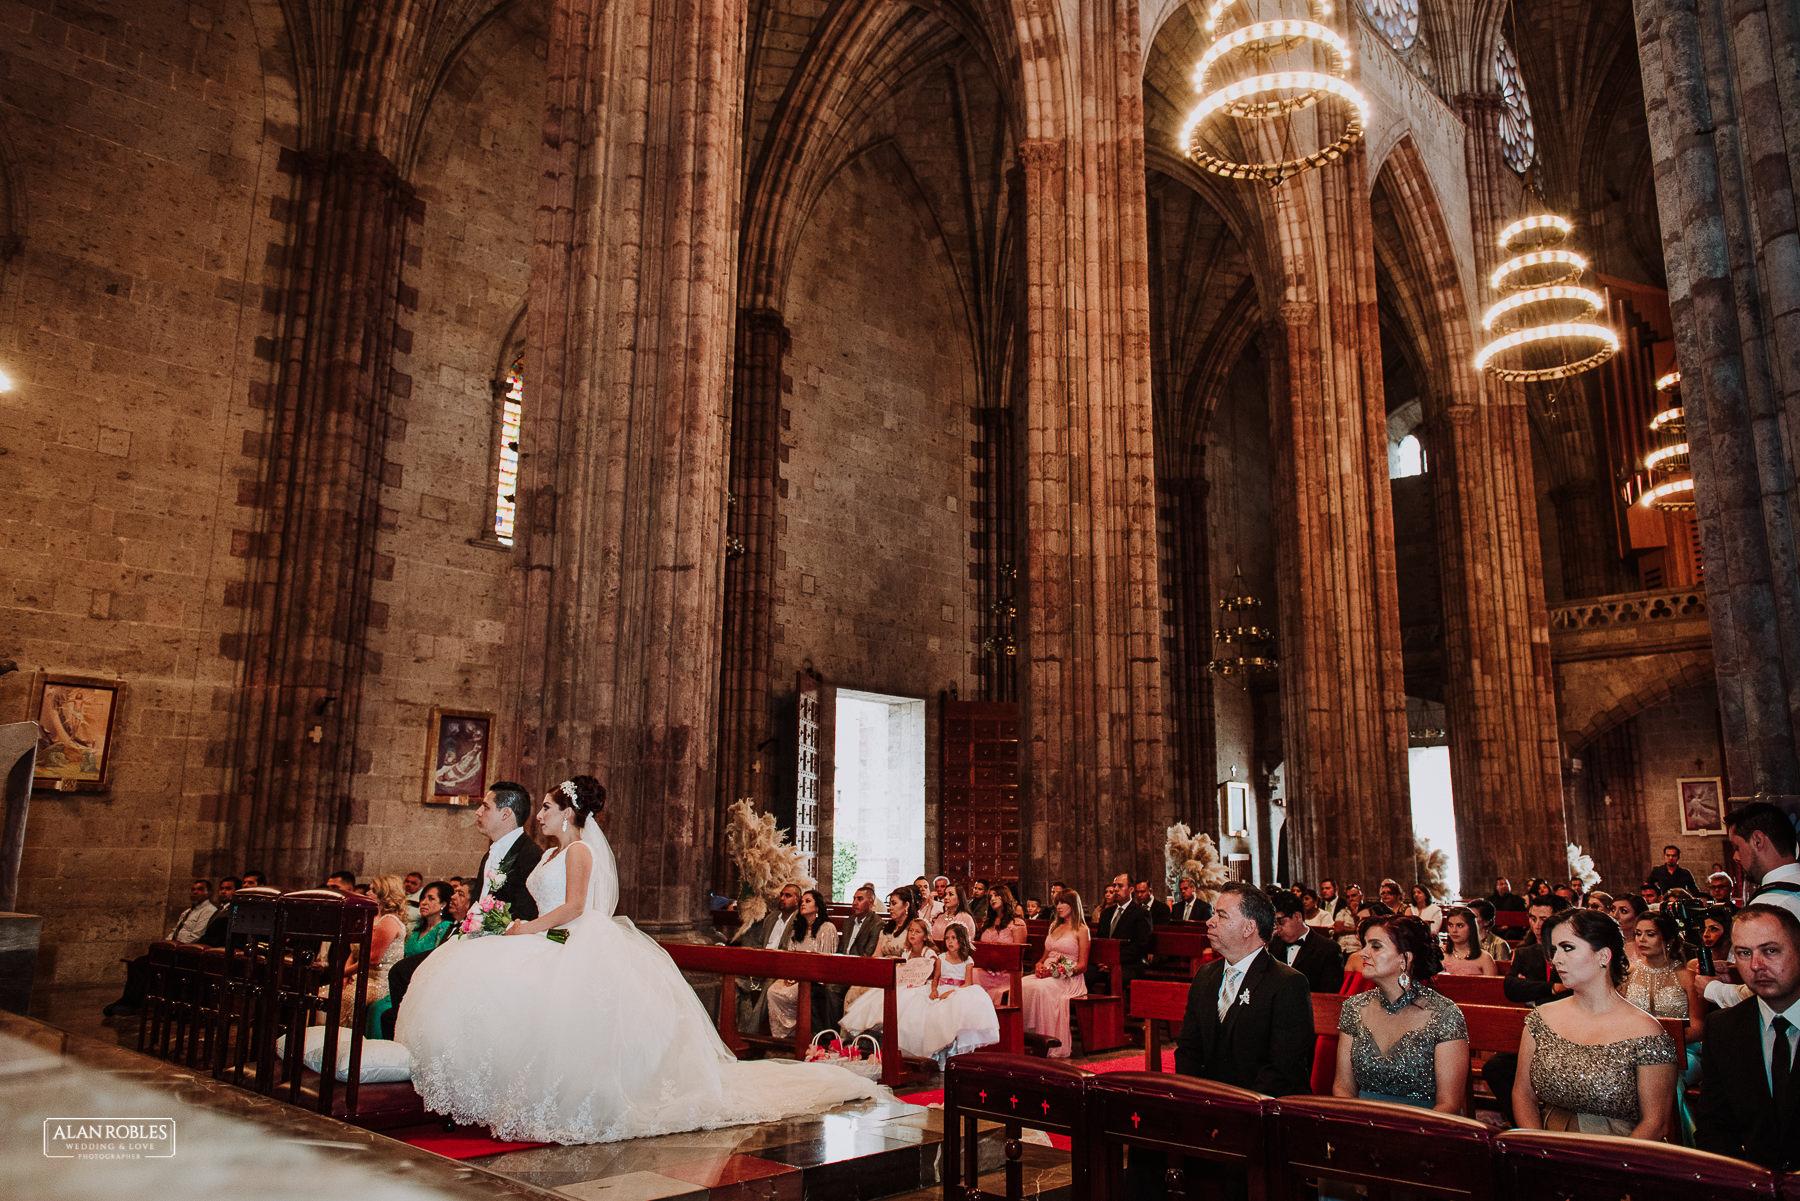 Alan Robles fotografo de bodas guadalajara - LyP Hotel Demetria-48